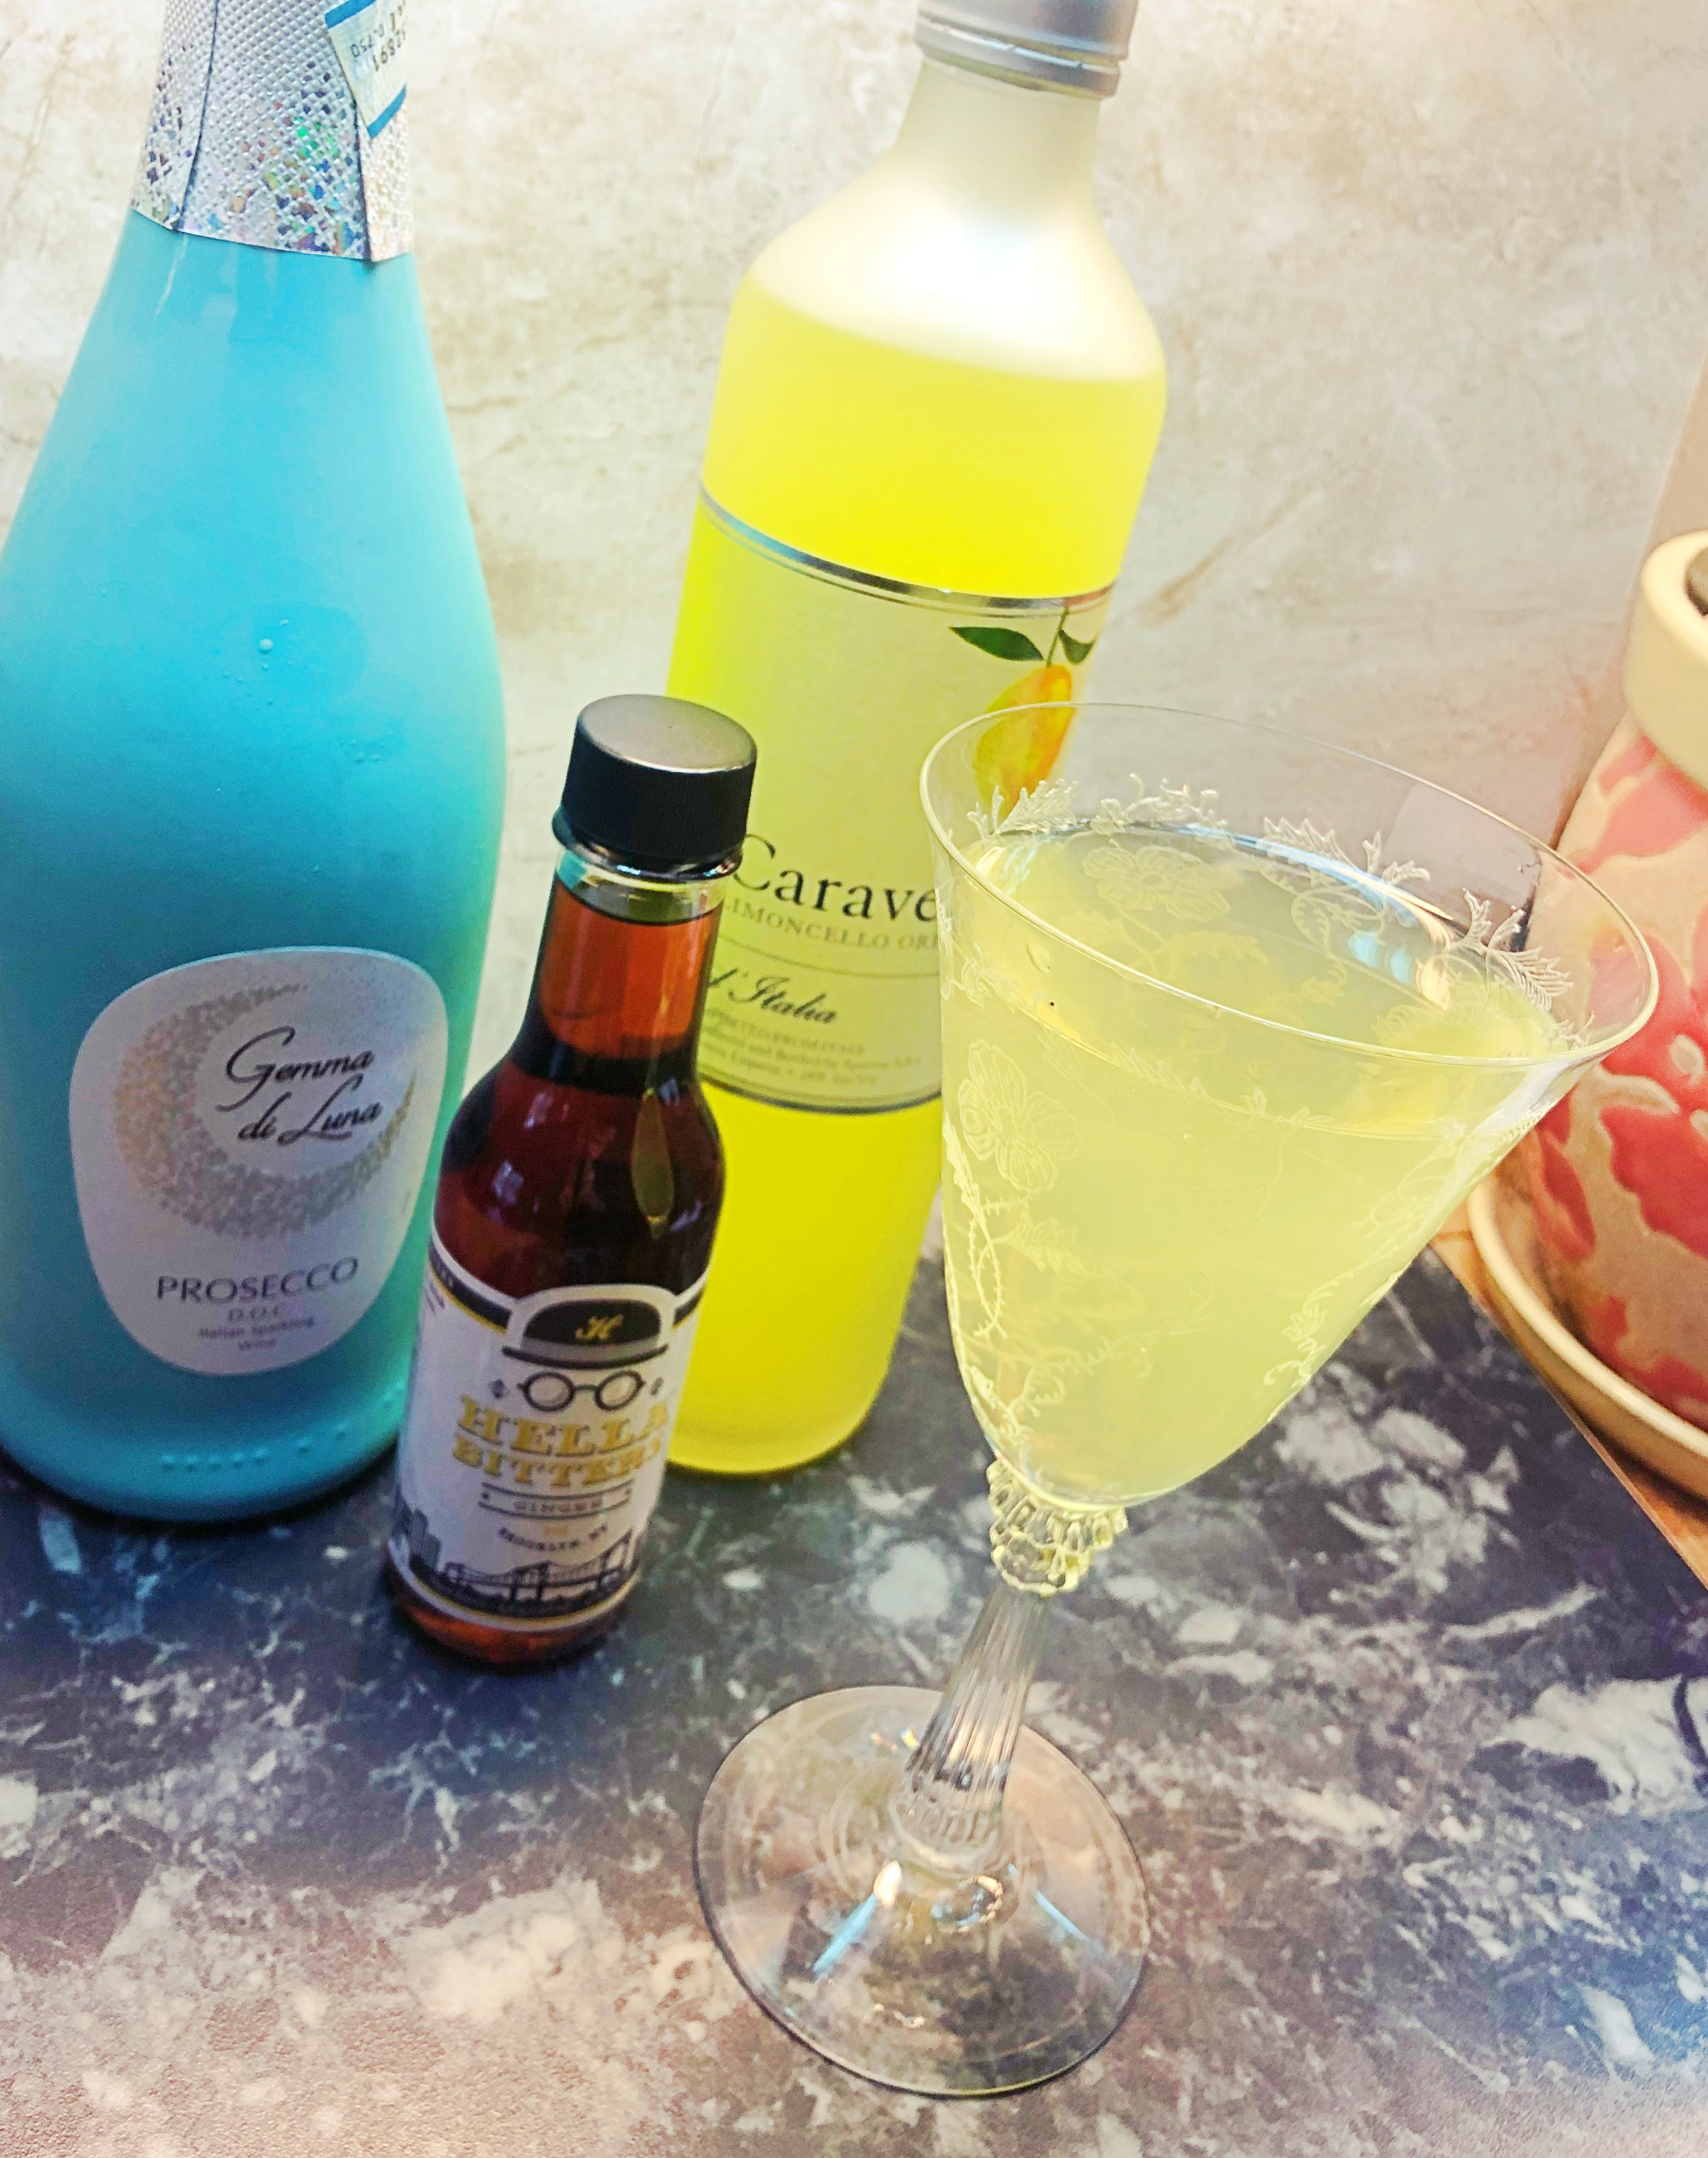 The Isabella Ross Bellini — prosecco, limoncello, and ginger bitters / Handbag Marinara / @handbagmarinara